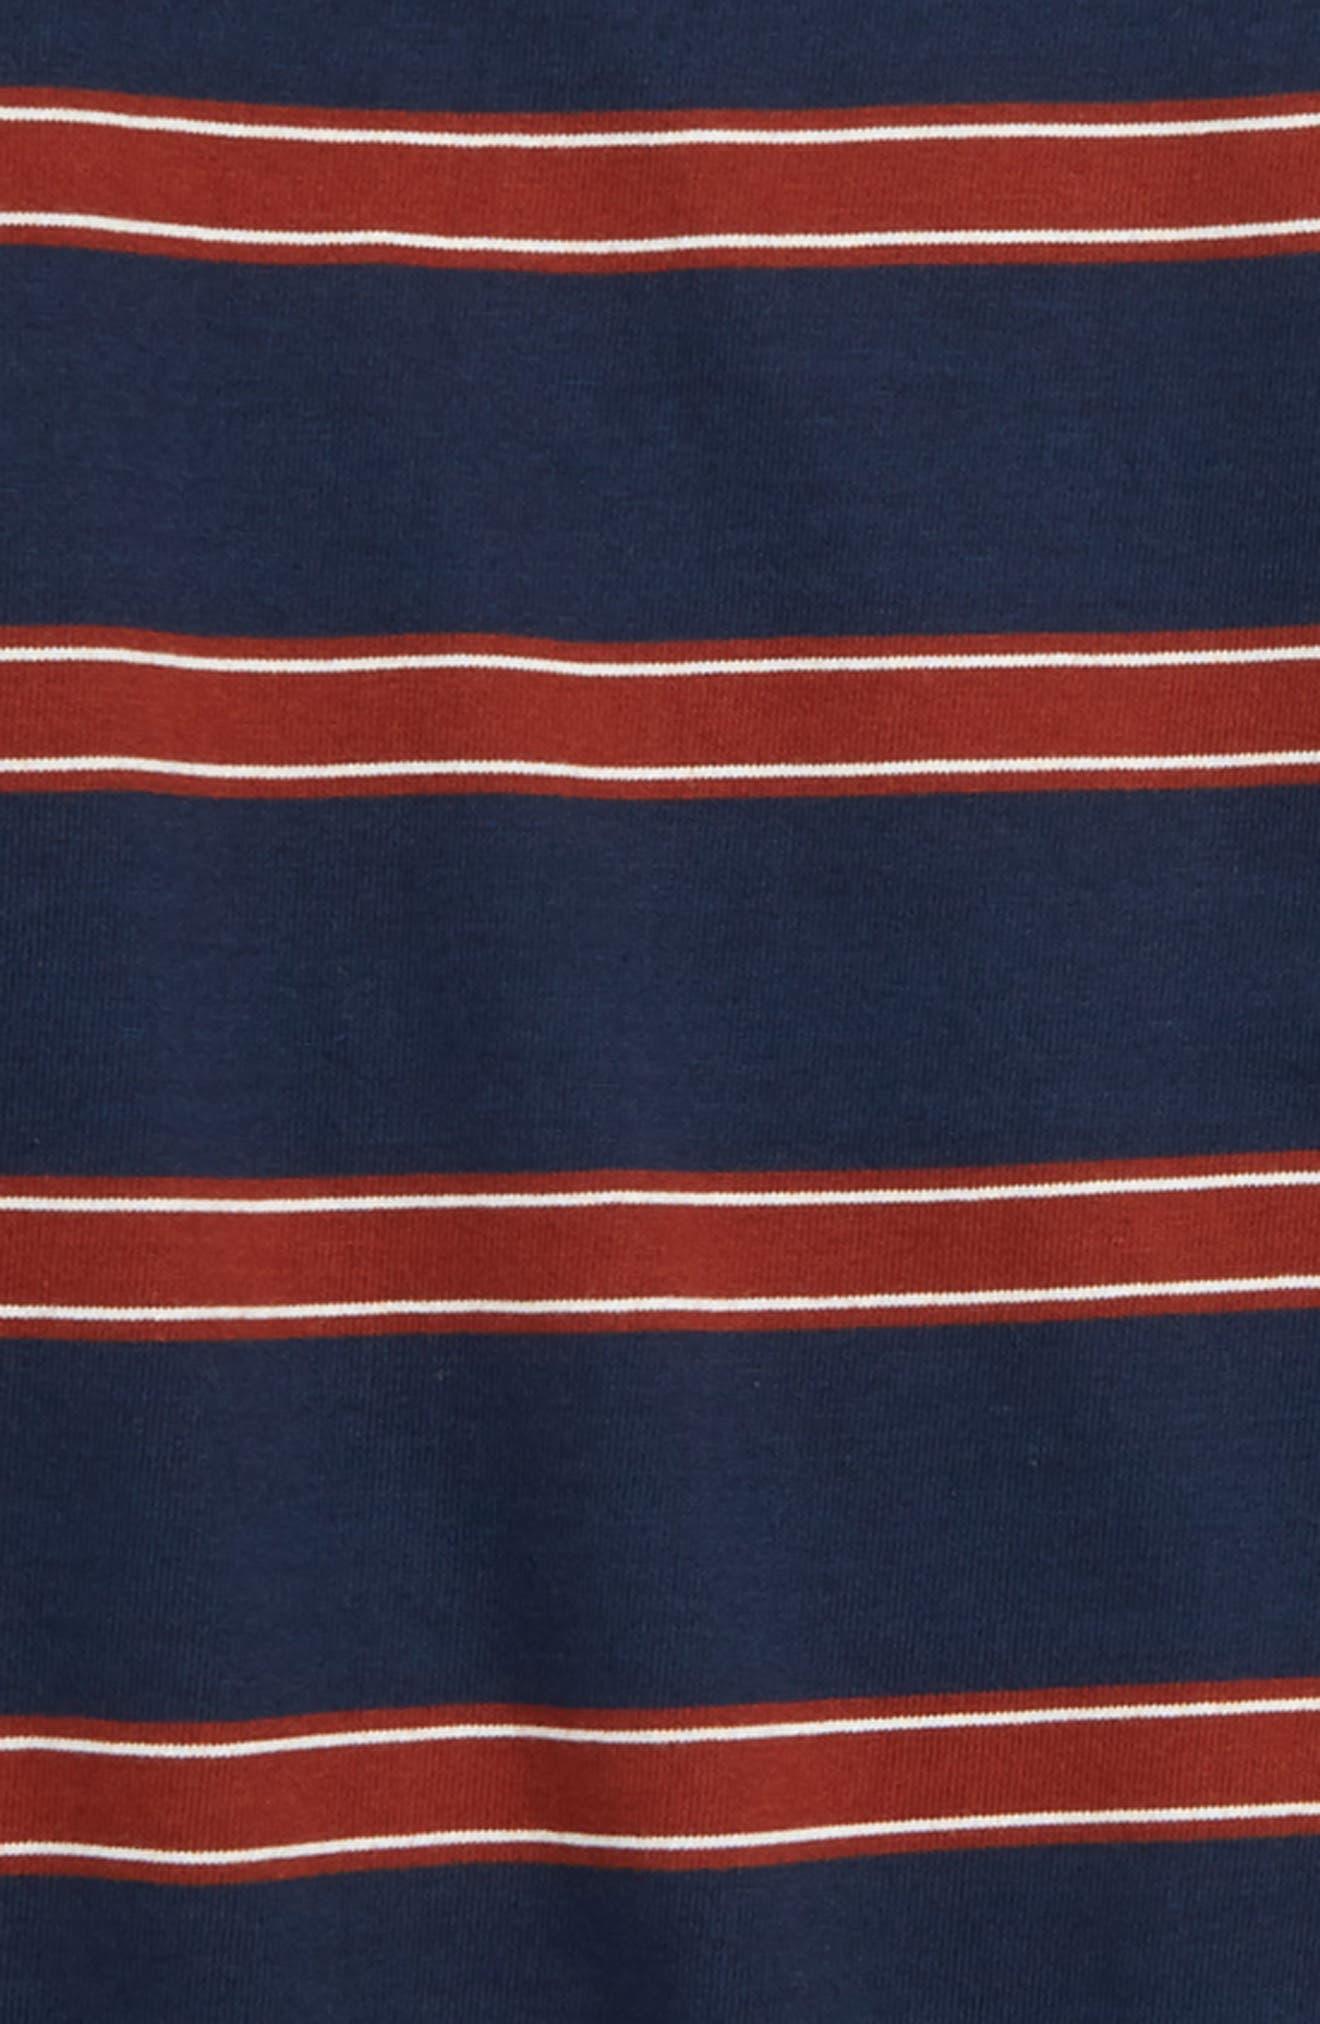 Watson Stripe Shirt,                             Alternate thumbnail 2, color,                             DRESS BLUES